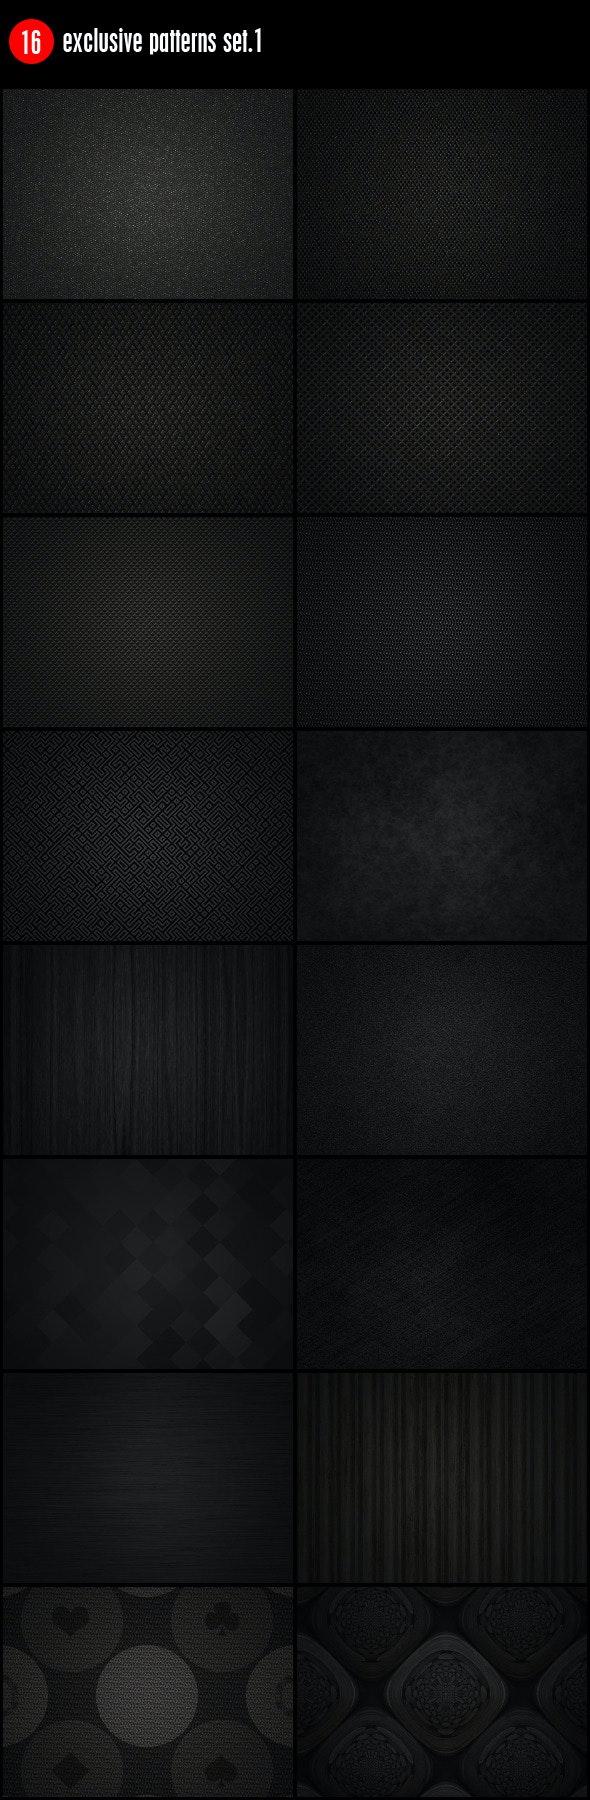 16 Exclusive Patterns Set.1 - Urban Textures / Fills / Patterns